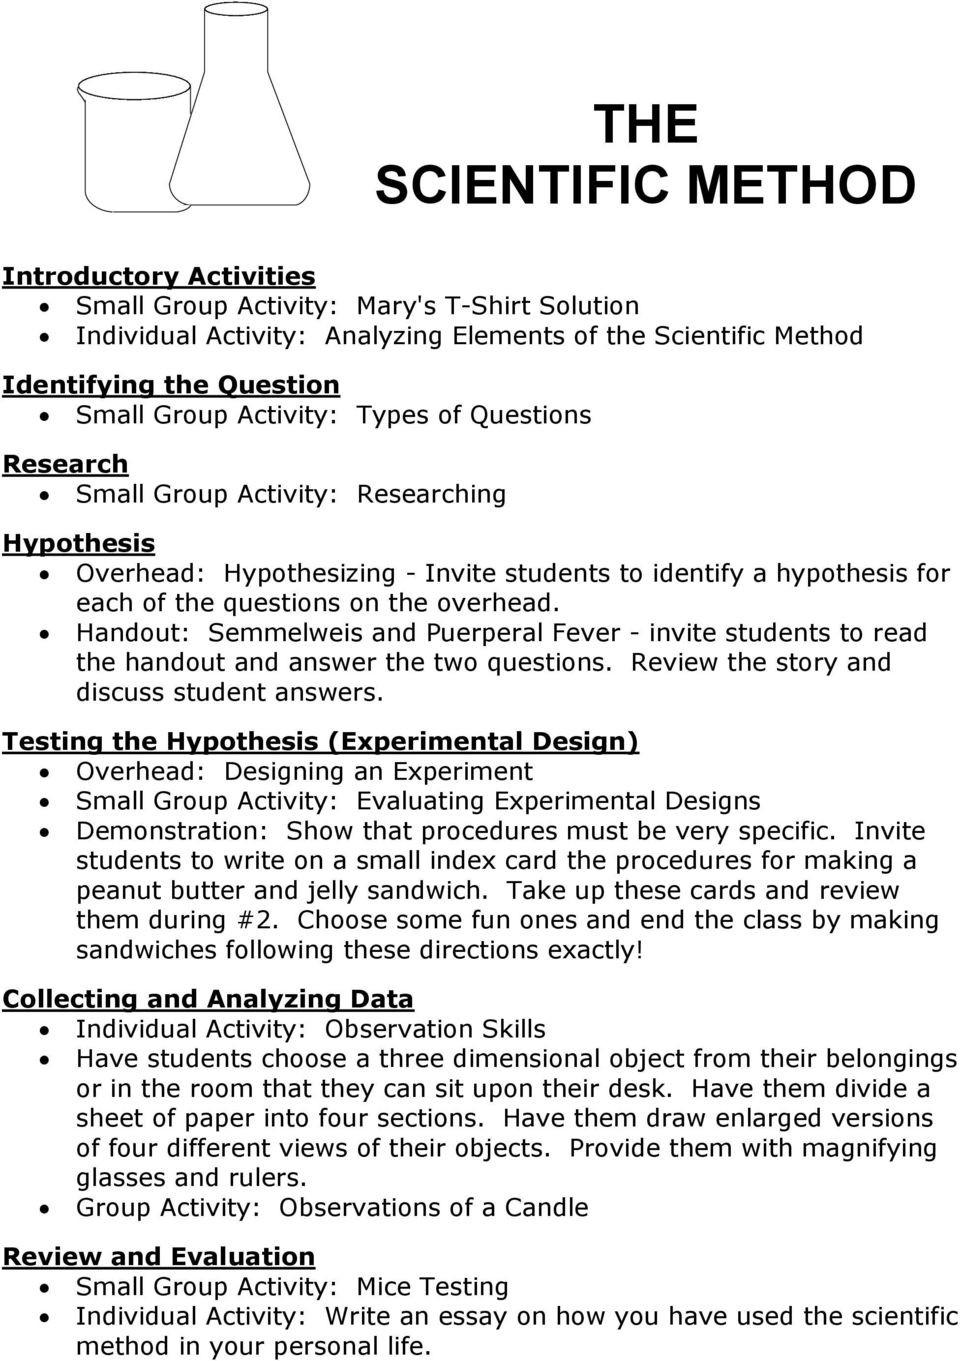 Scientific Method Worksheet Answer Key the Scientific Method Pdf Free Download